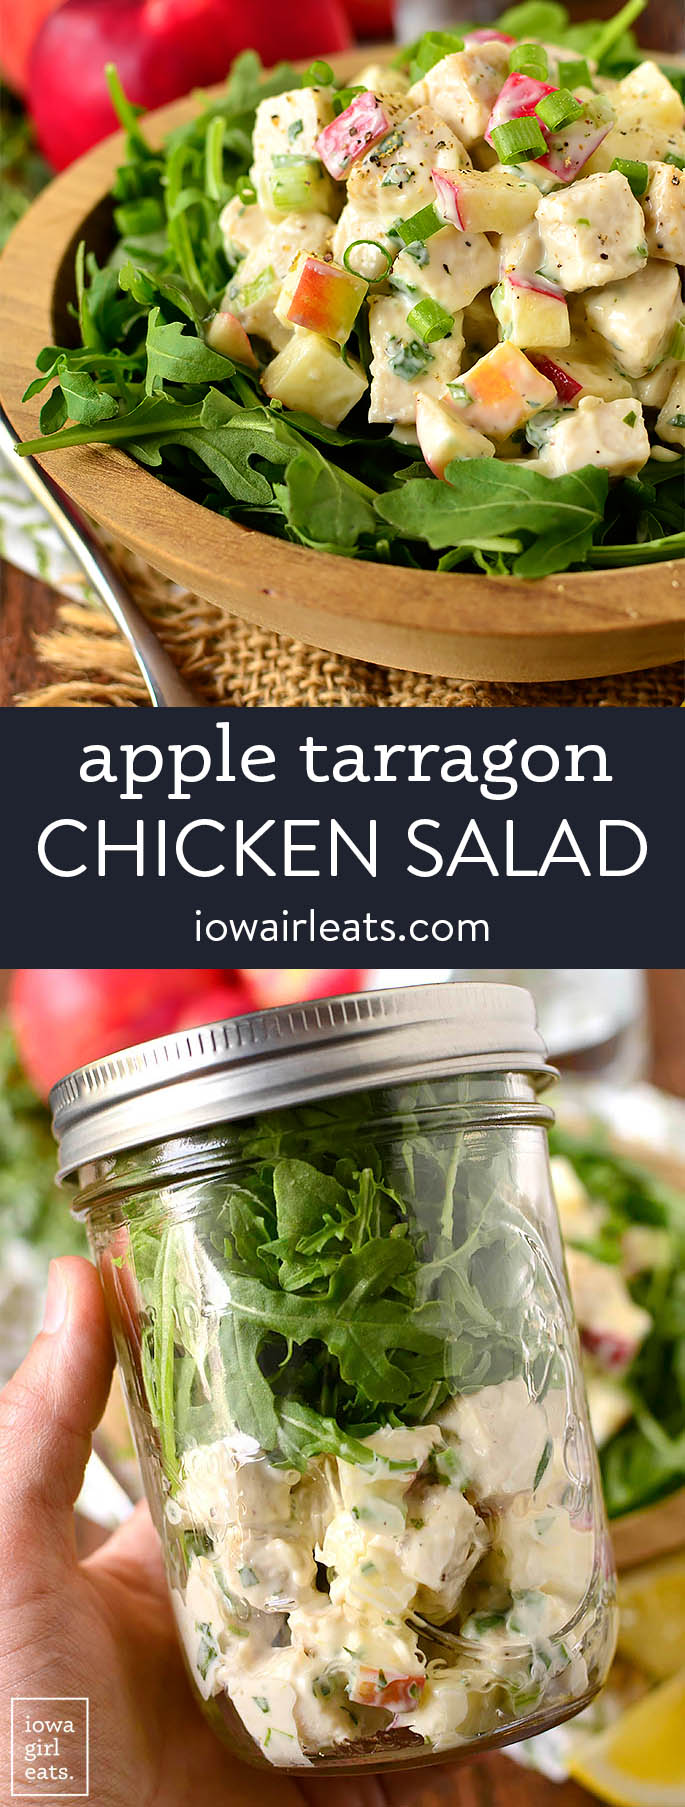 photo collage of apple tarragon chicken salad